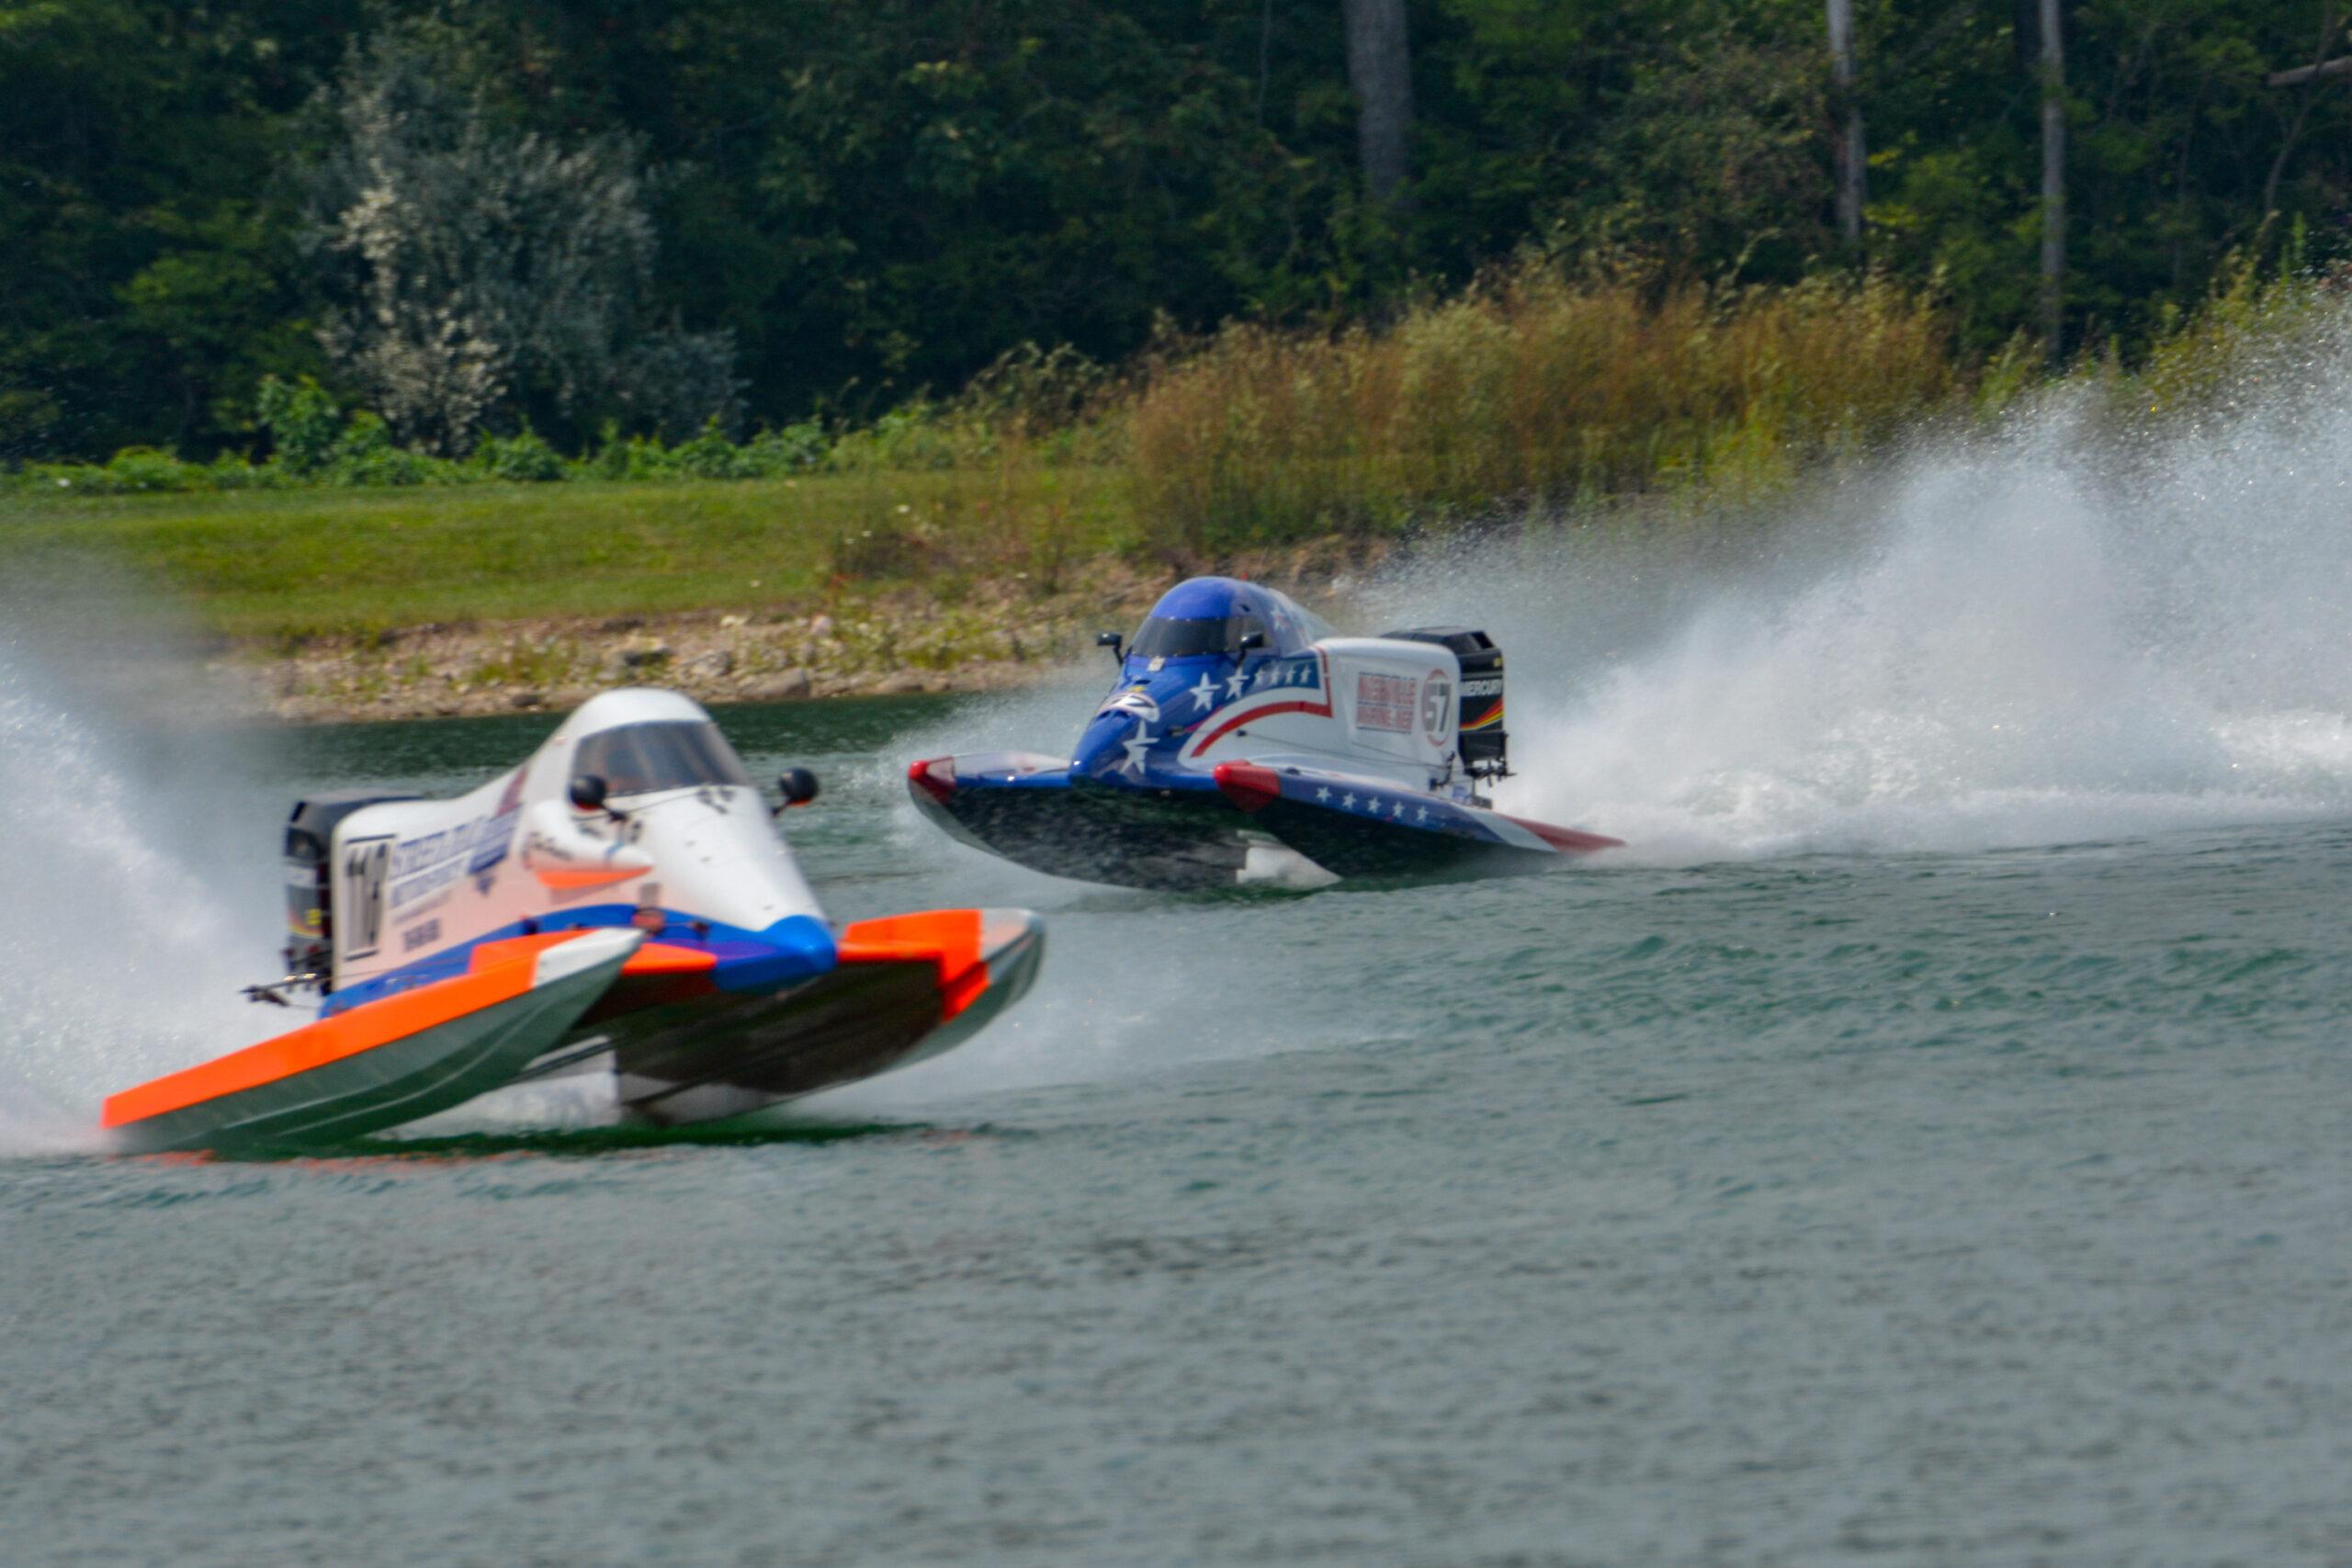 McMurray Racing Nashville Marine 2021 Springfield F1 Race-5